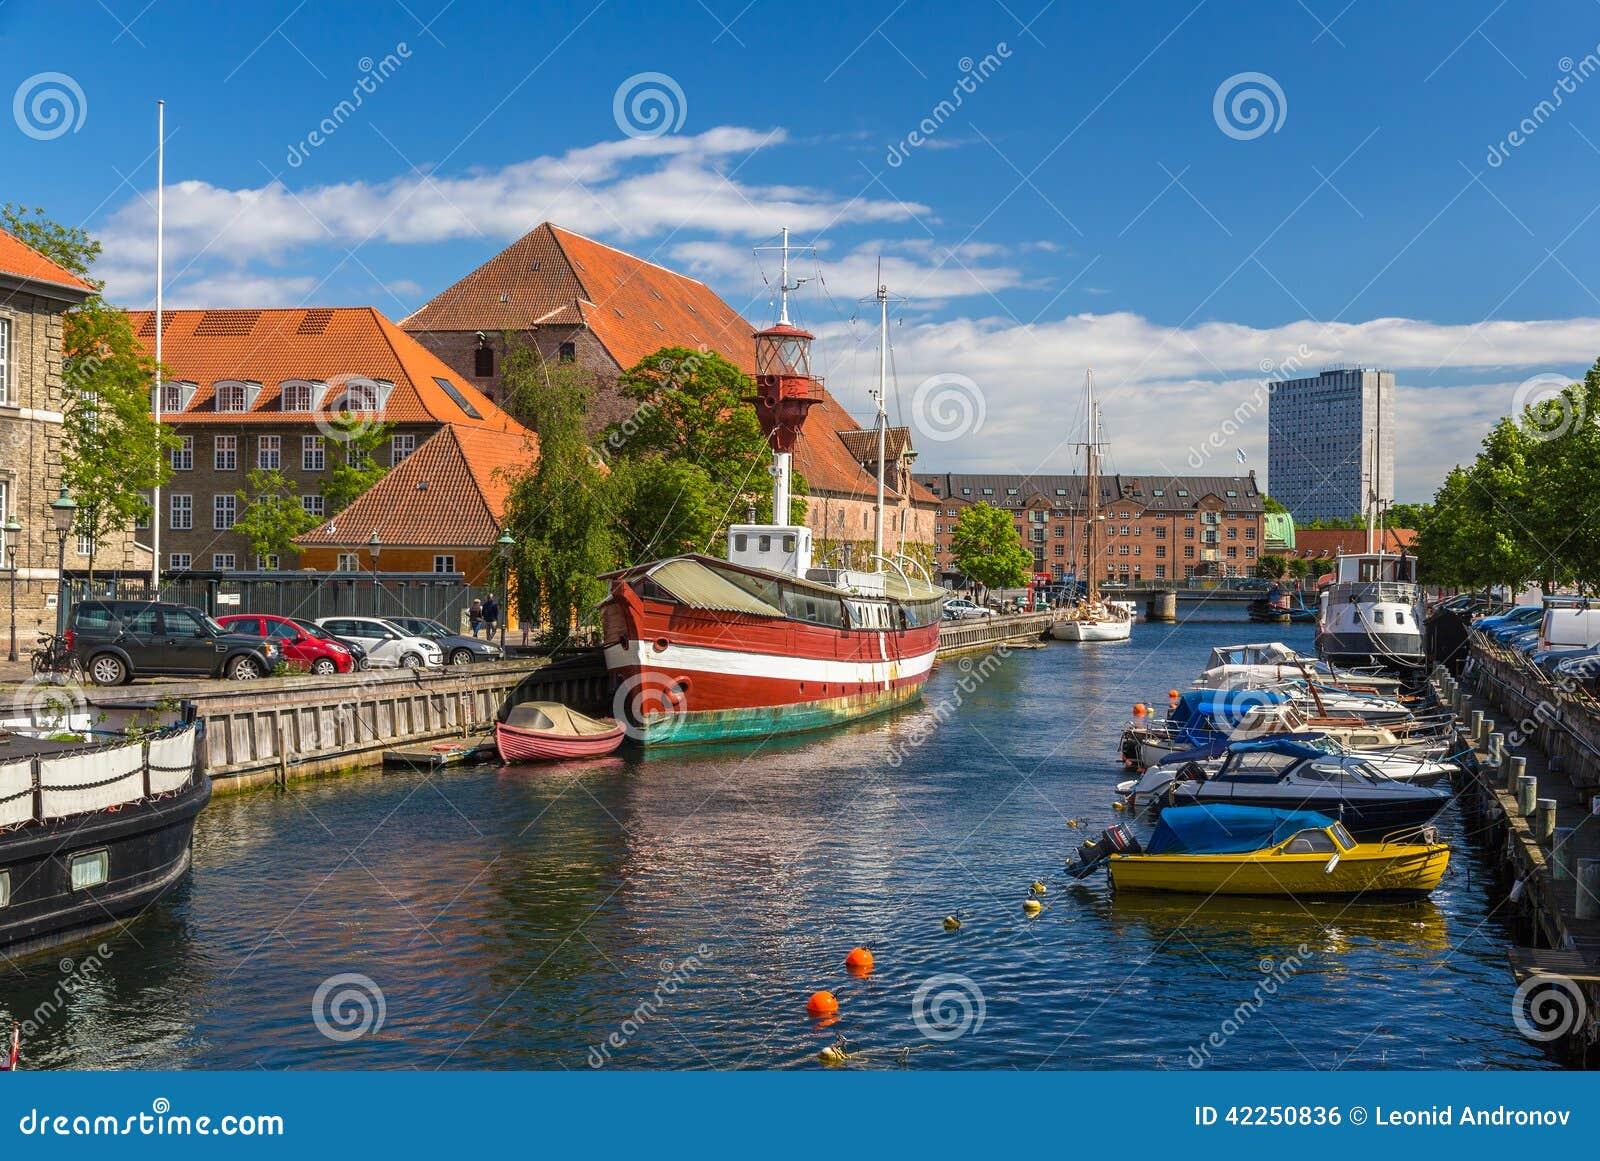 Canal no centro da cidade de Copenhaga, Dinamarca